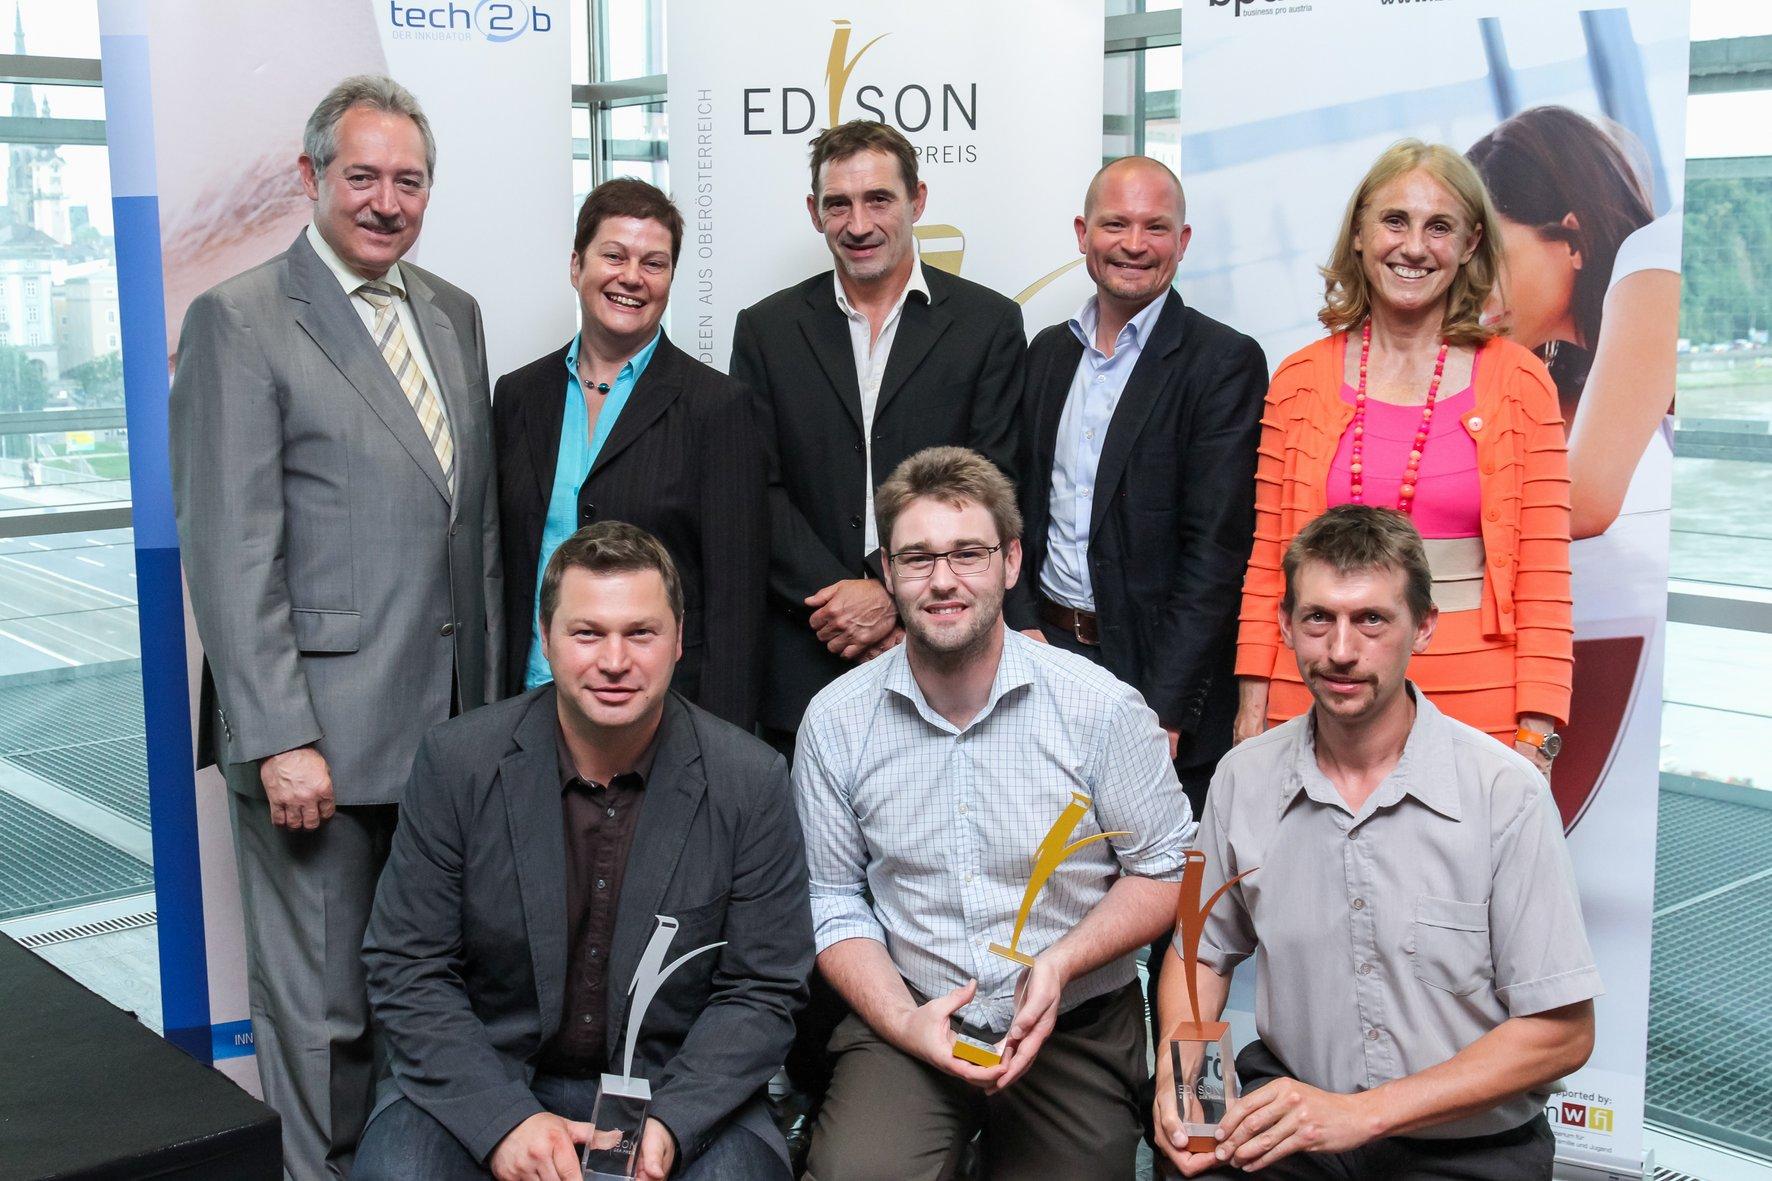 Finalist Edison 2012